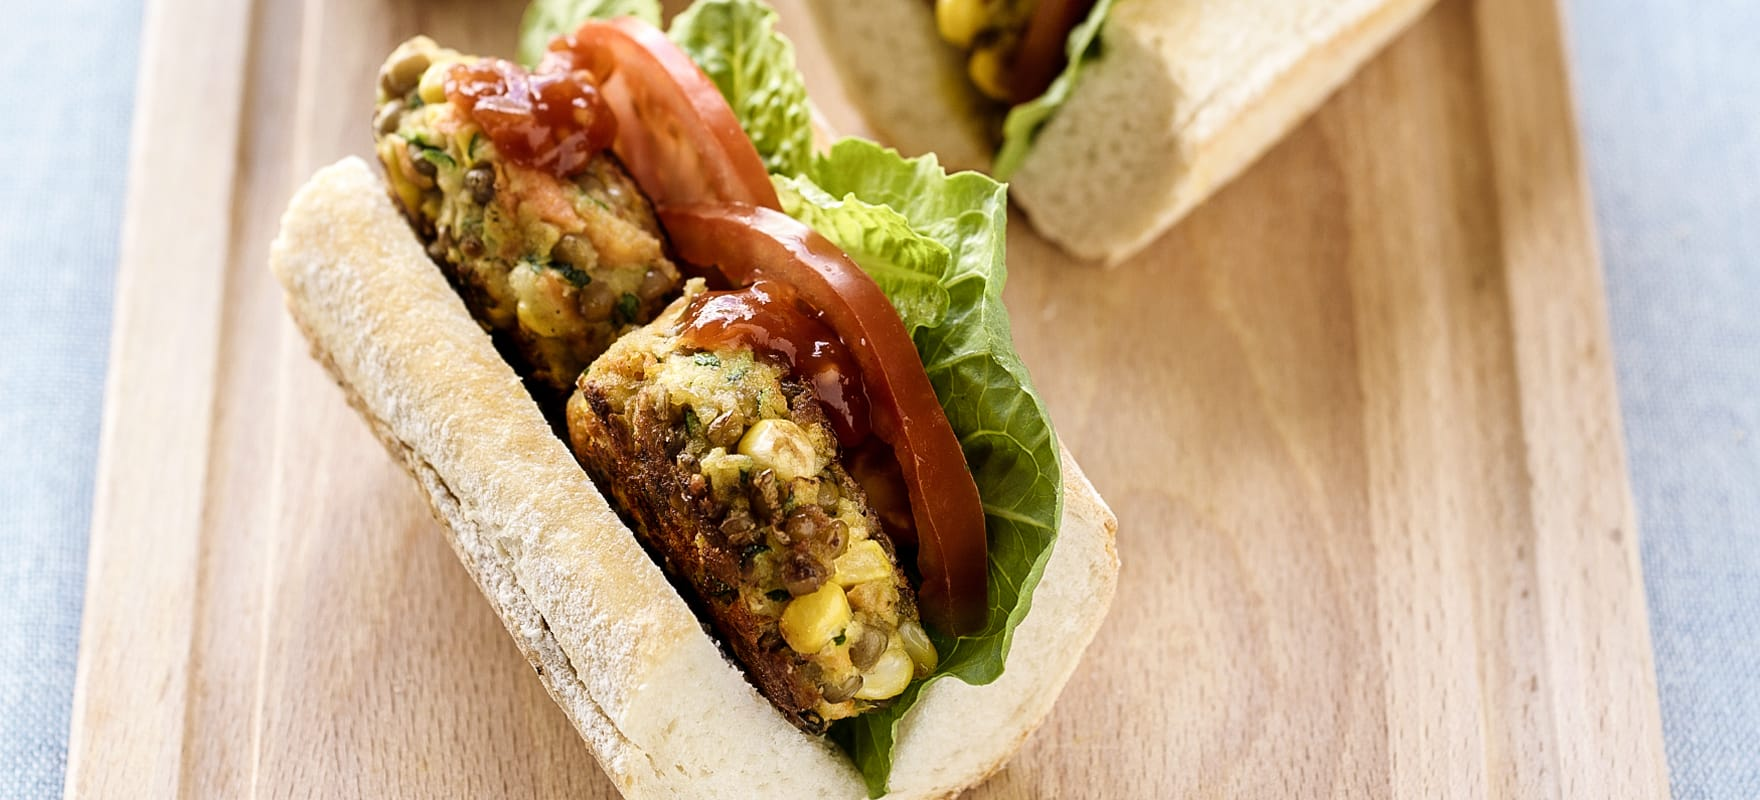 Vegetable burgers image 1